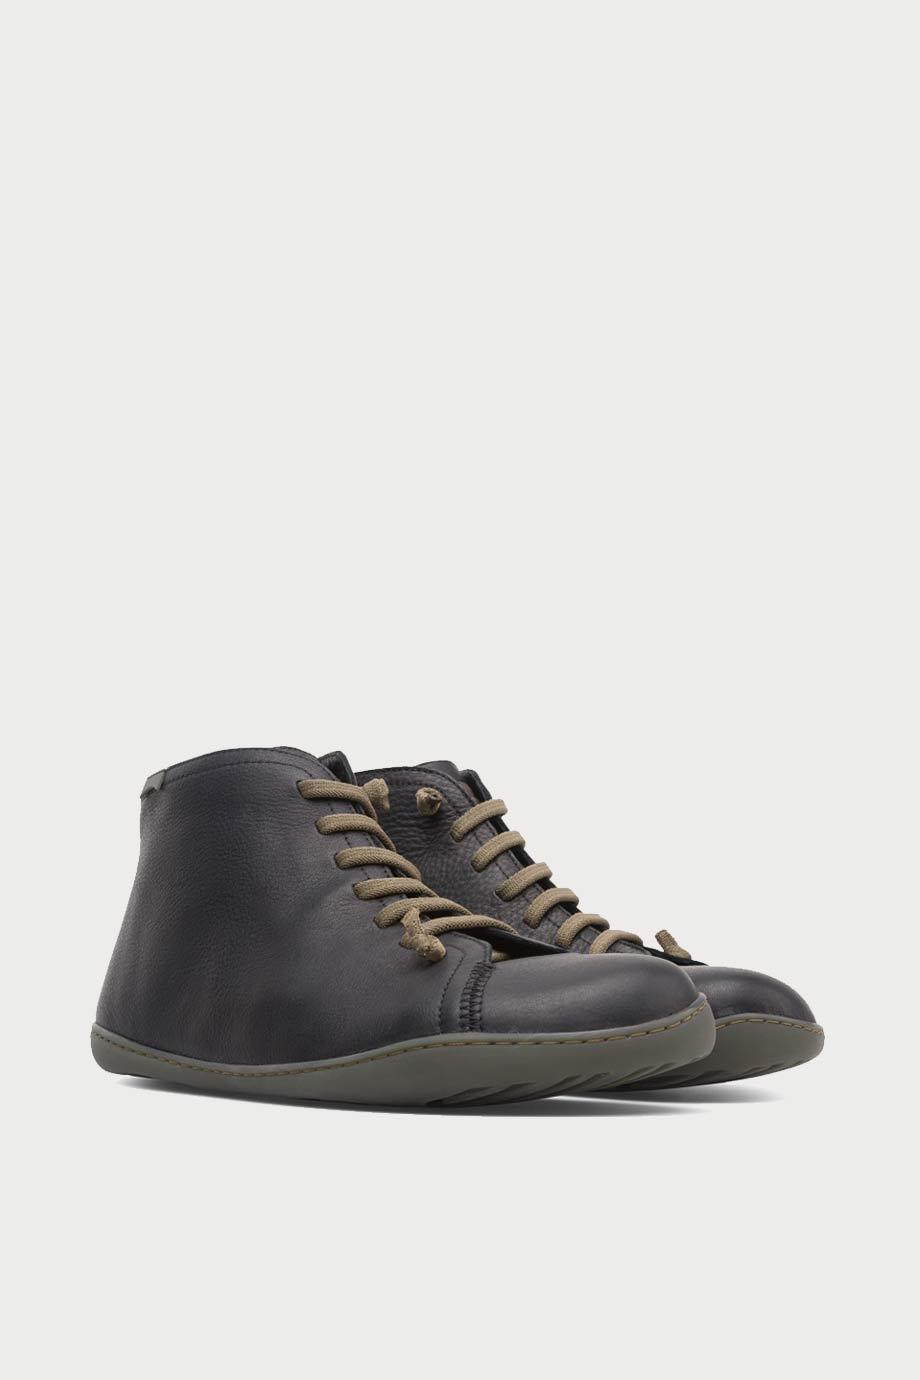 spiridoula metheniti shoes xalkida p 36411 093 peu cami camper 2